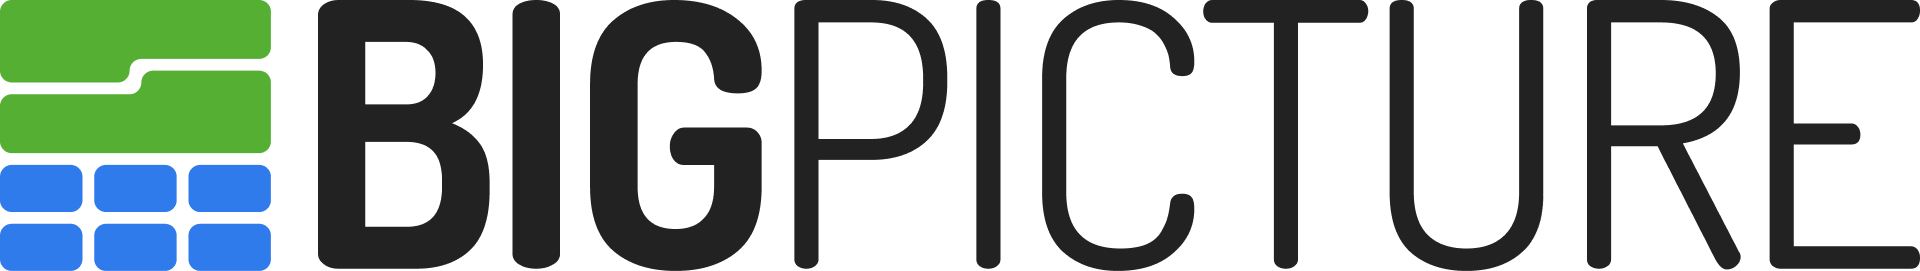 BigPicture logo